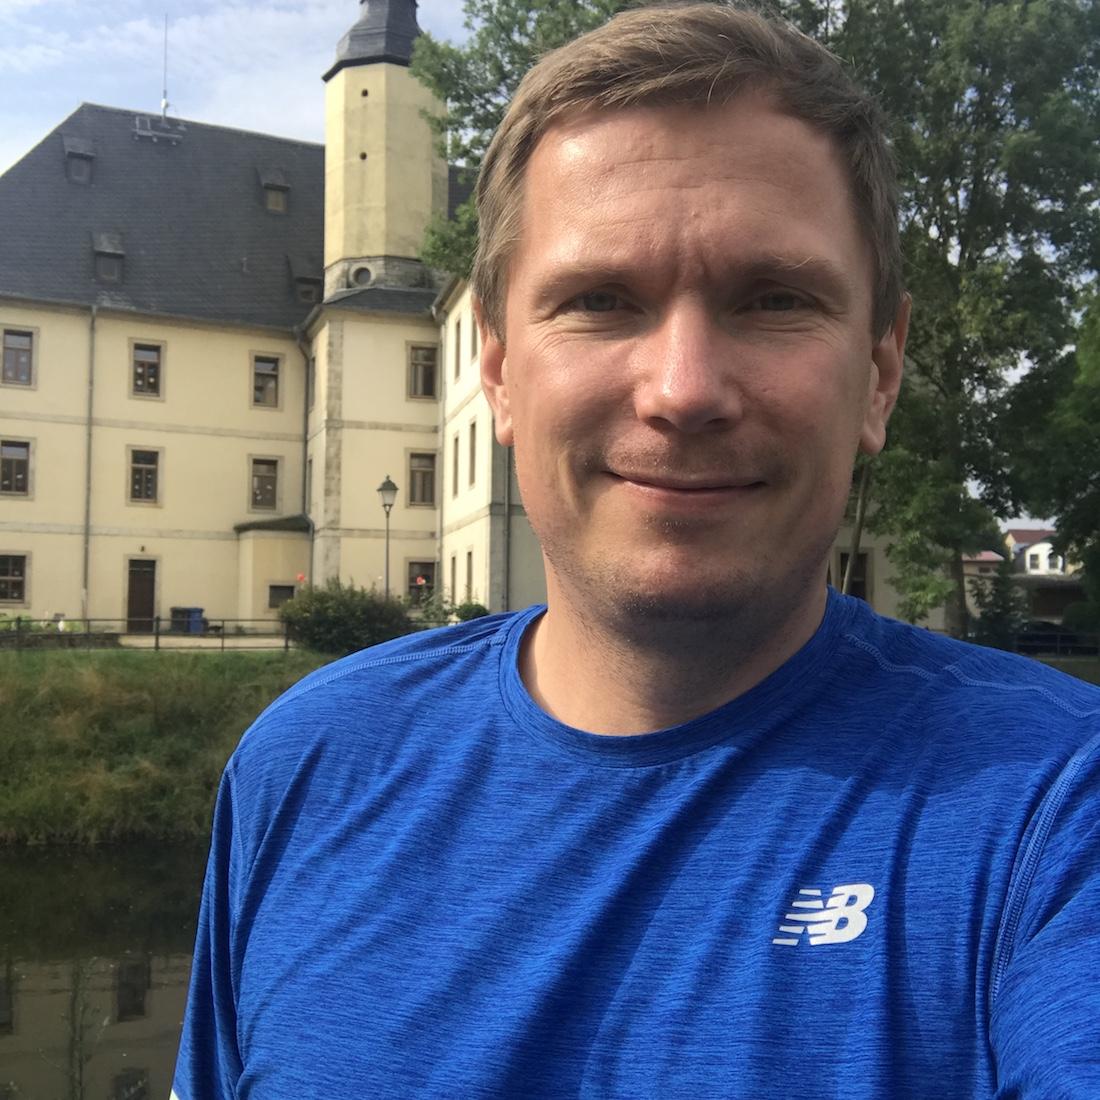 Laufblogger